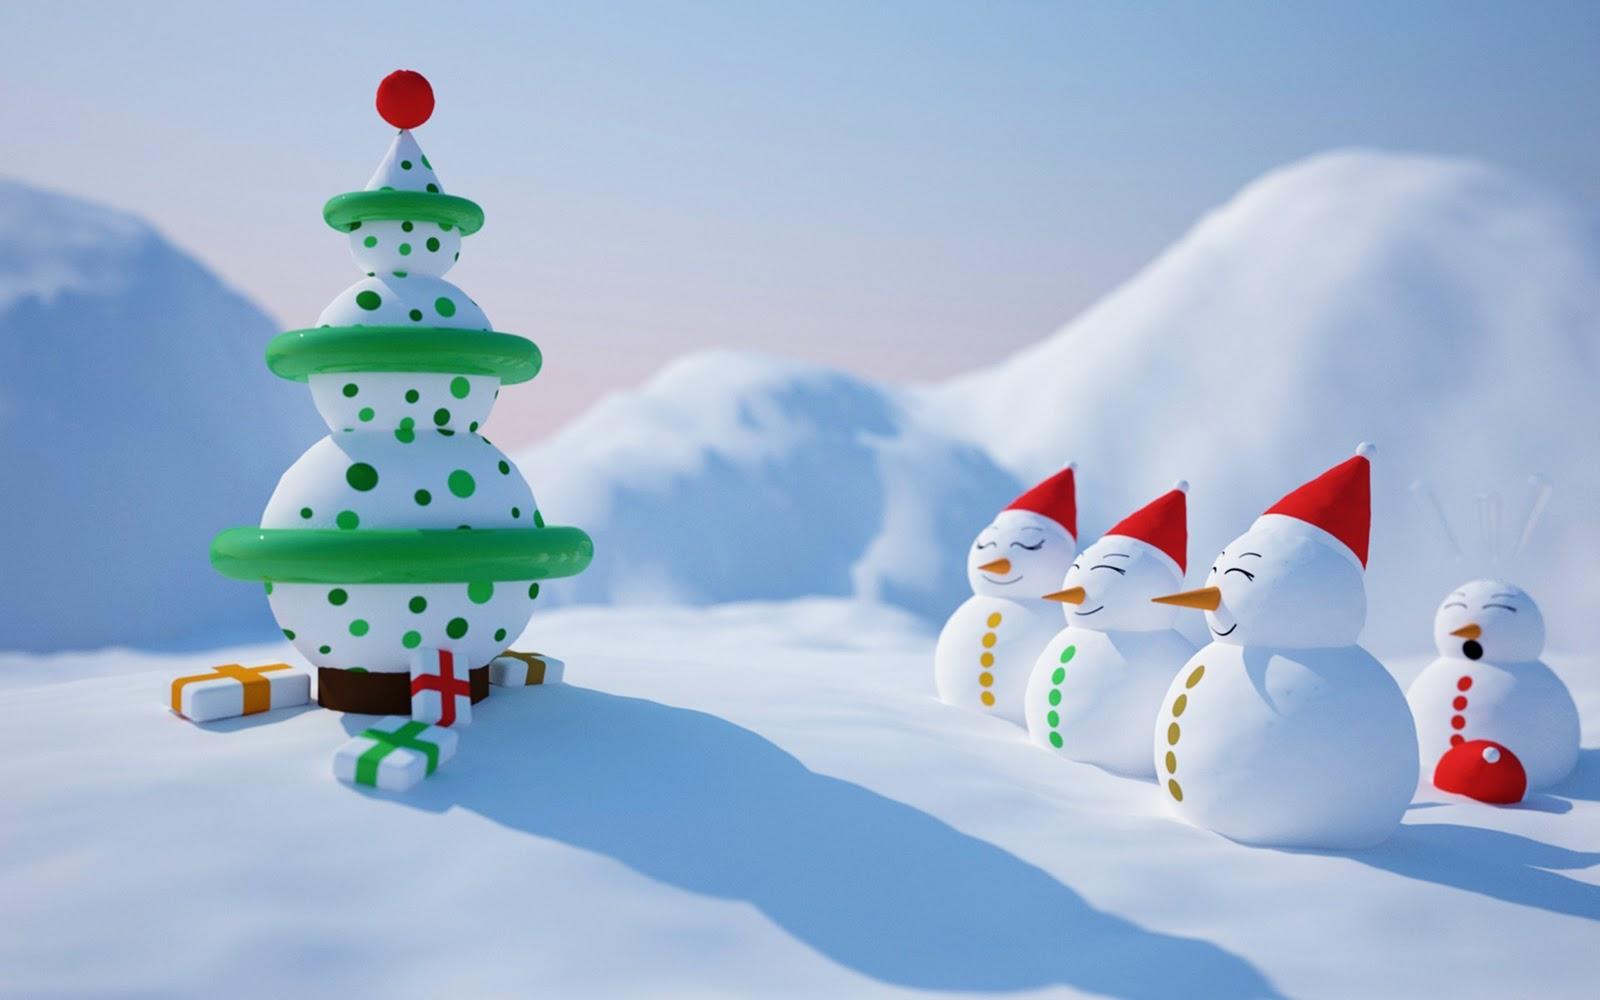 LATEST WALLPAPER Animated Christmas Desktop Backgrounds 1600x1000